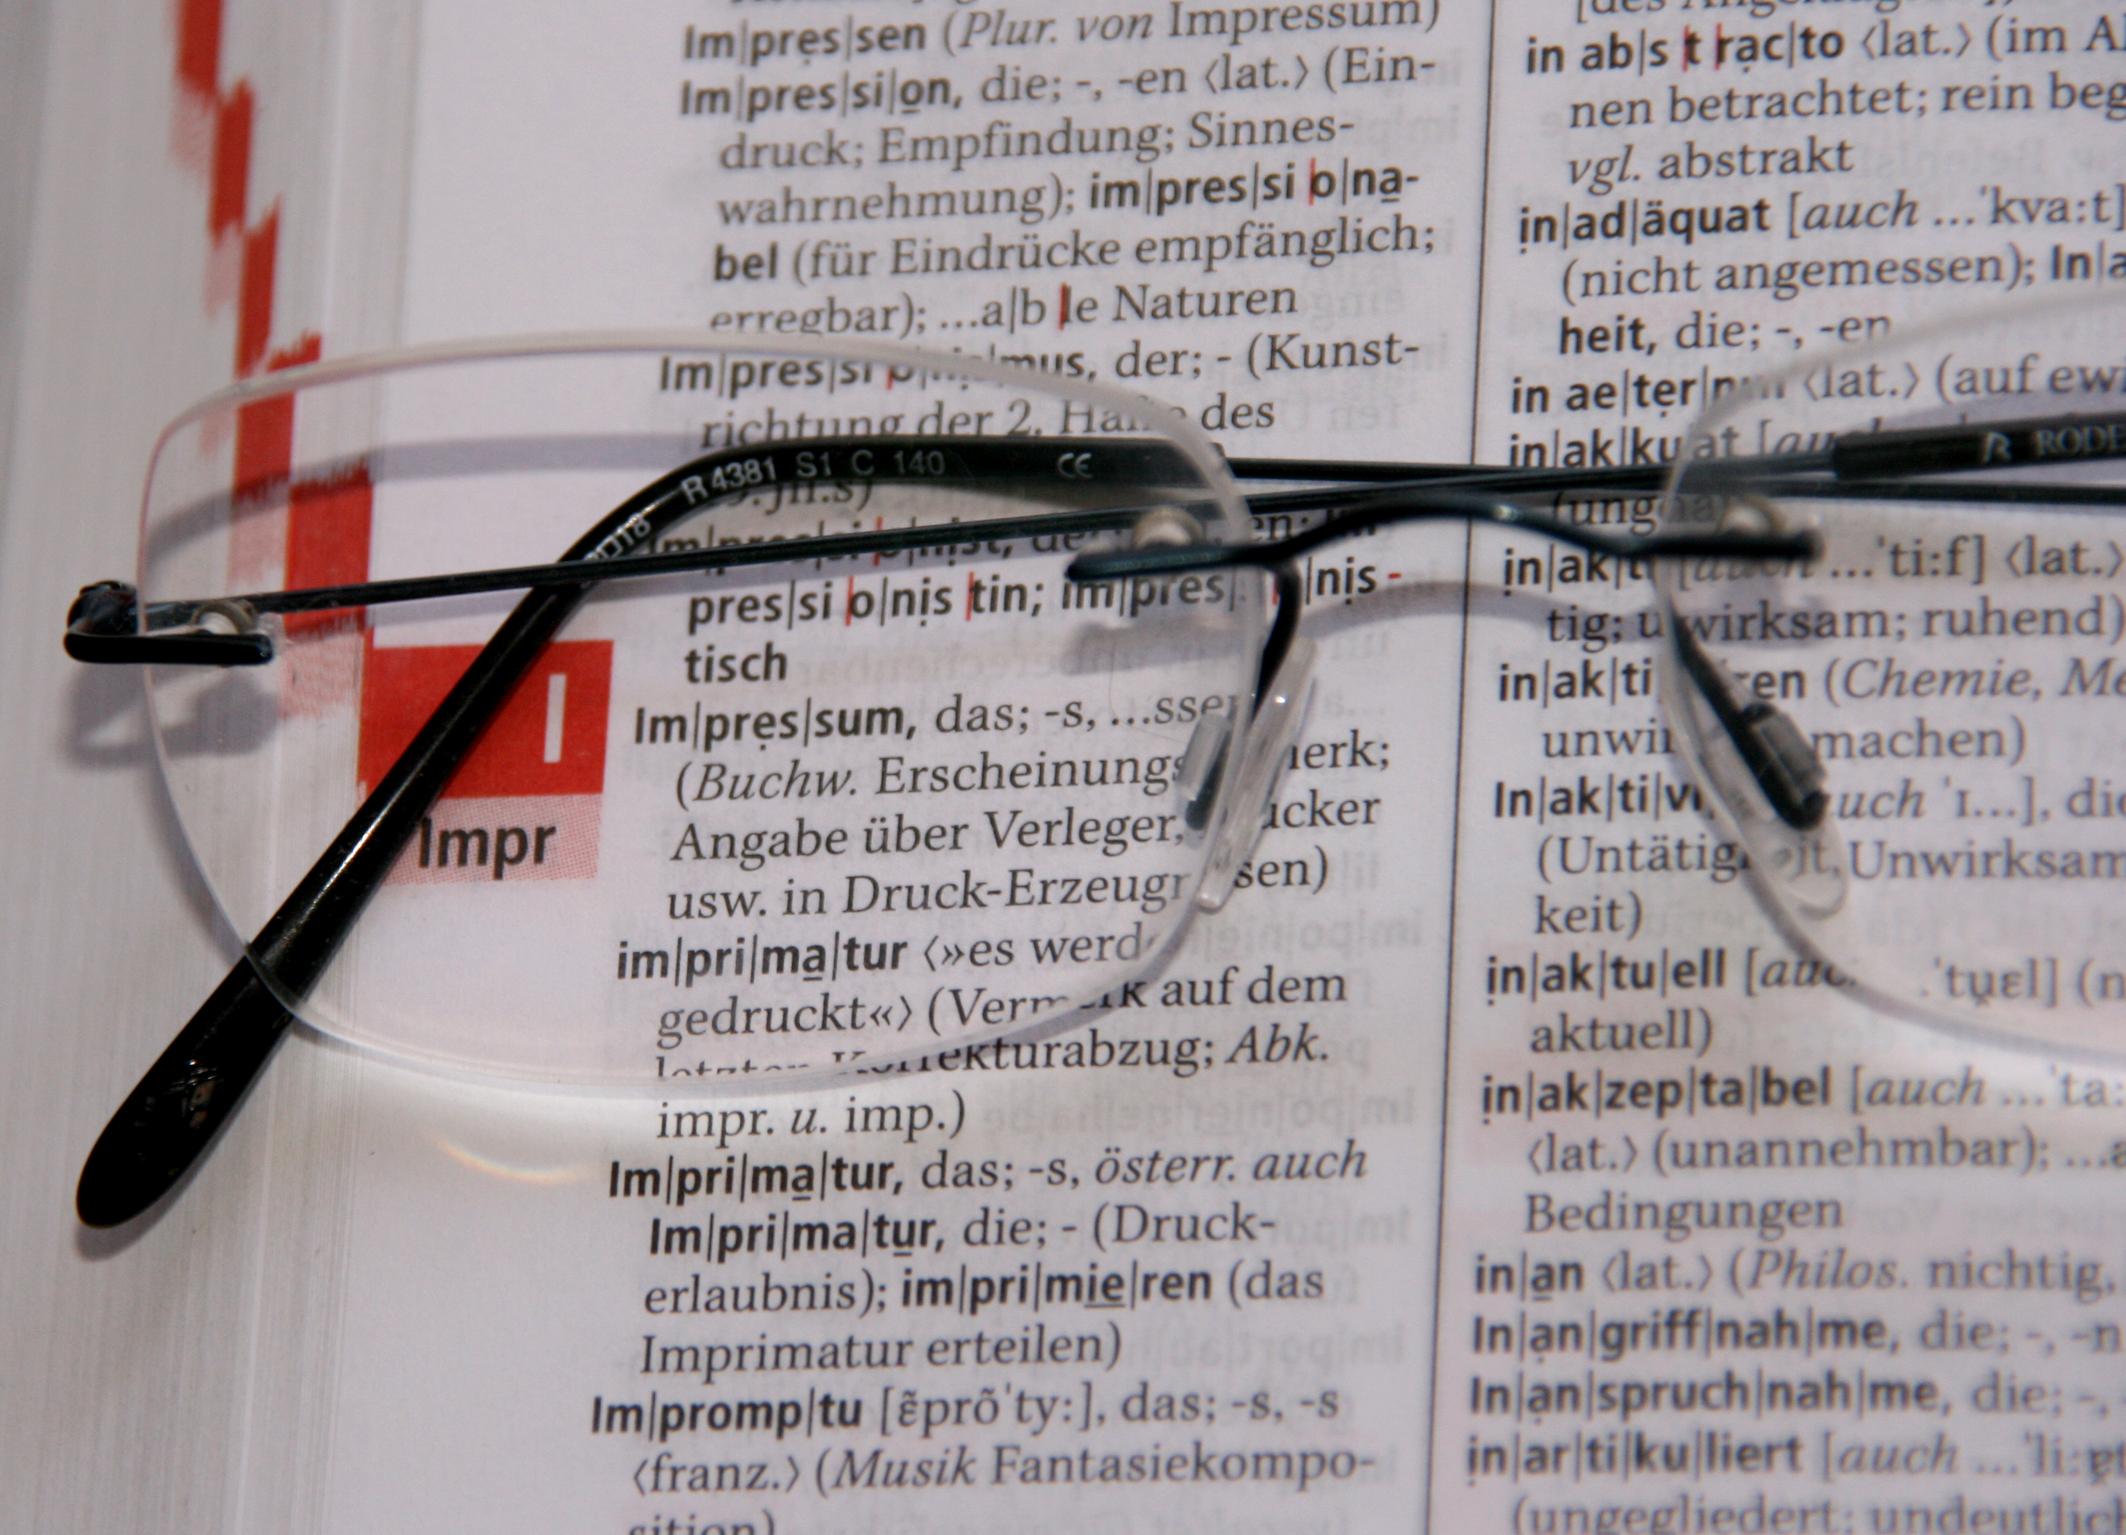 Kindle als Wörterbuch (Bild: Regina Kaute / pixelio.de)